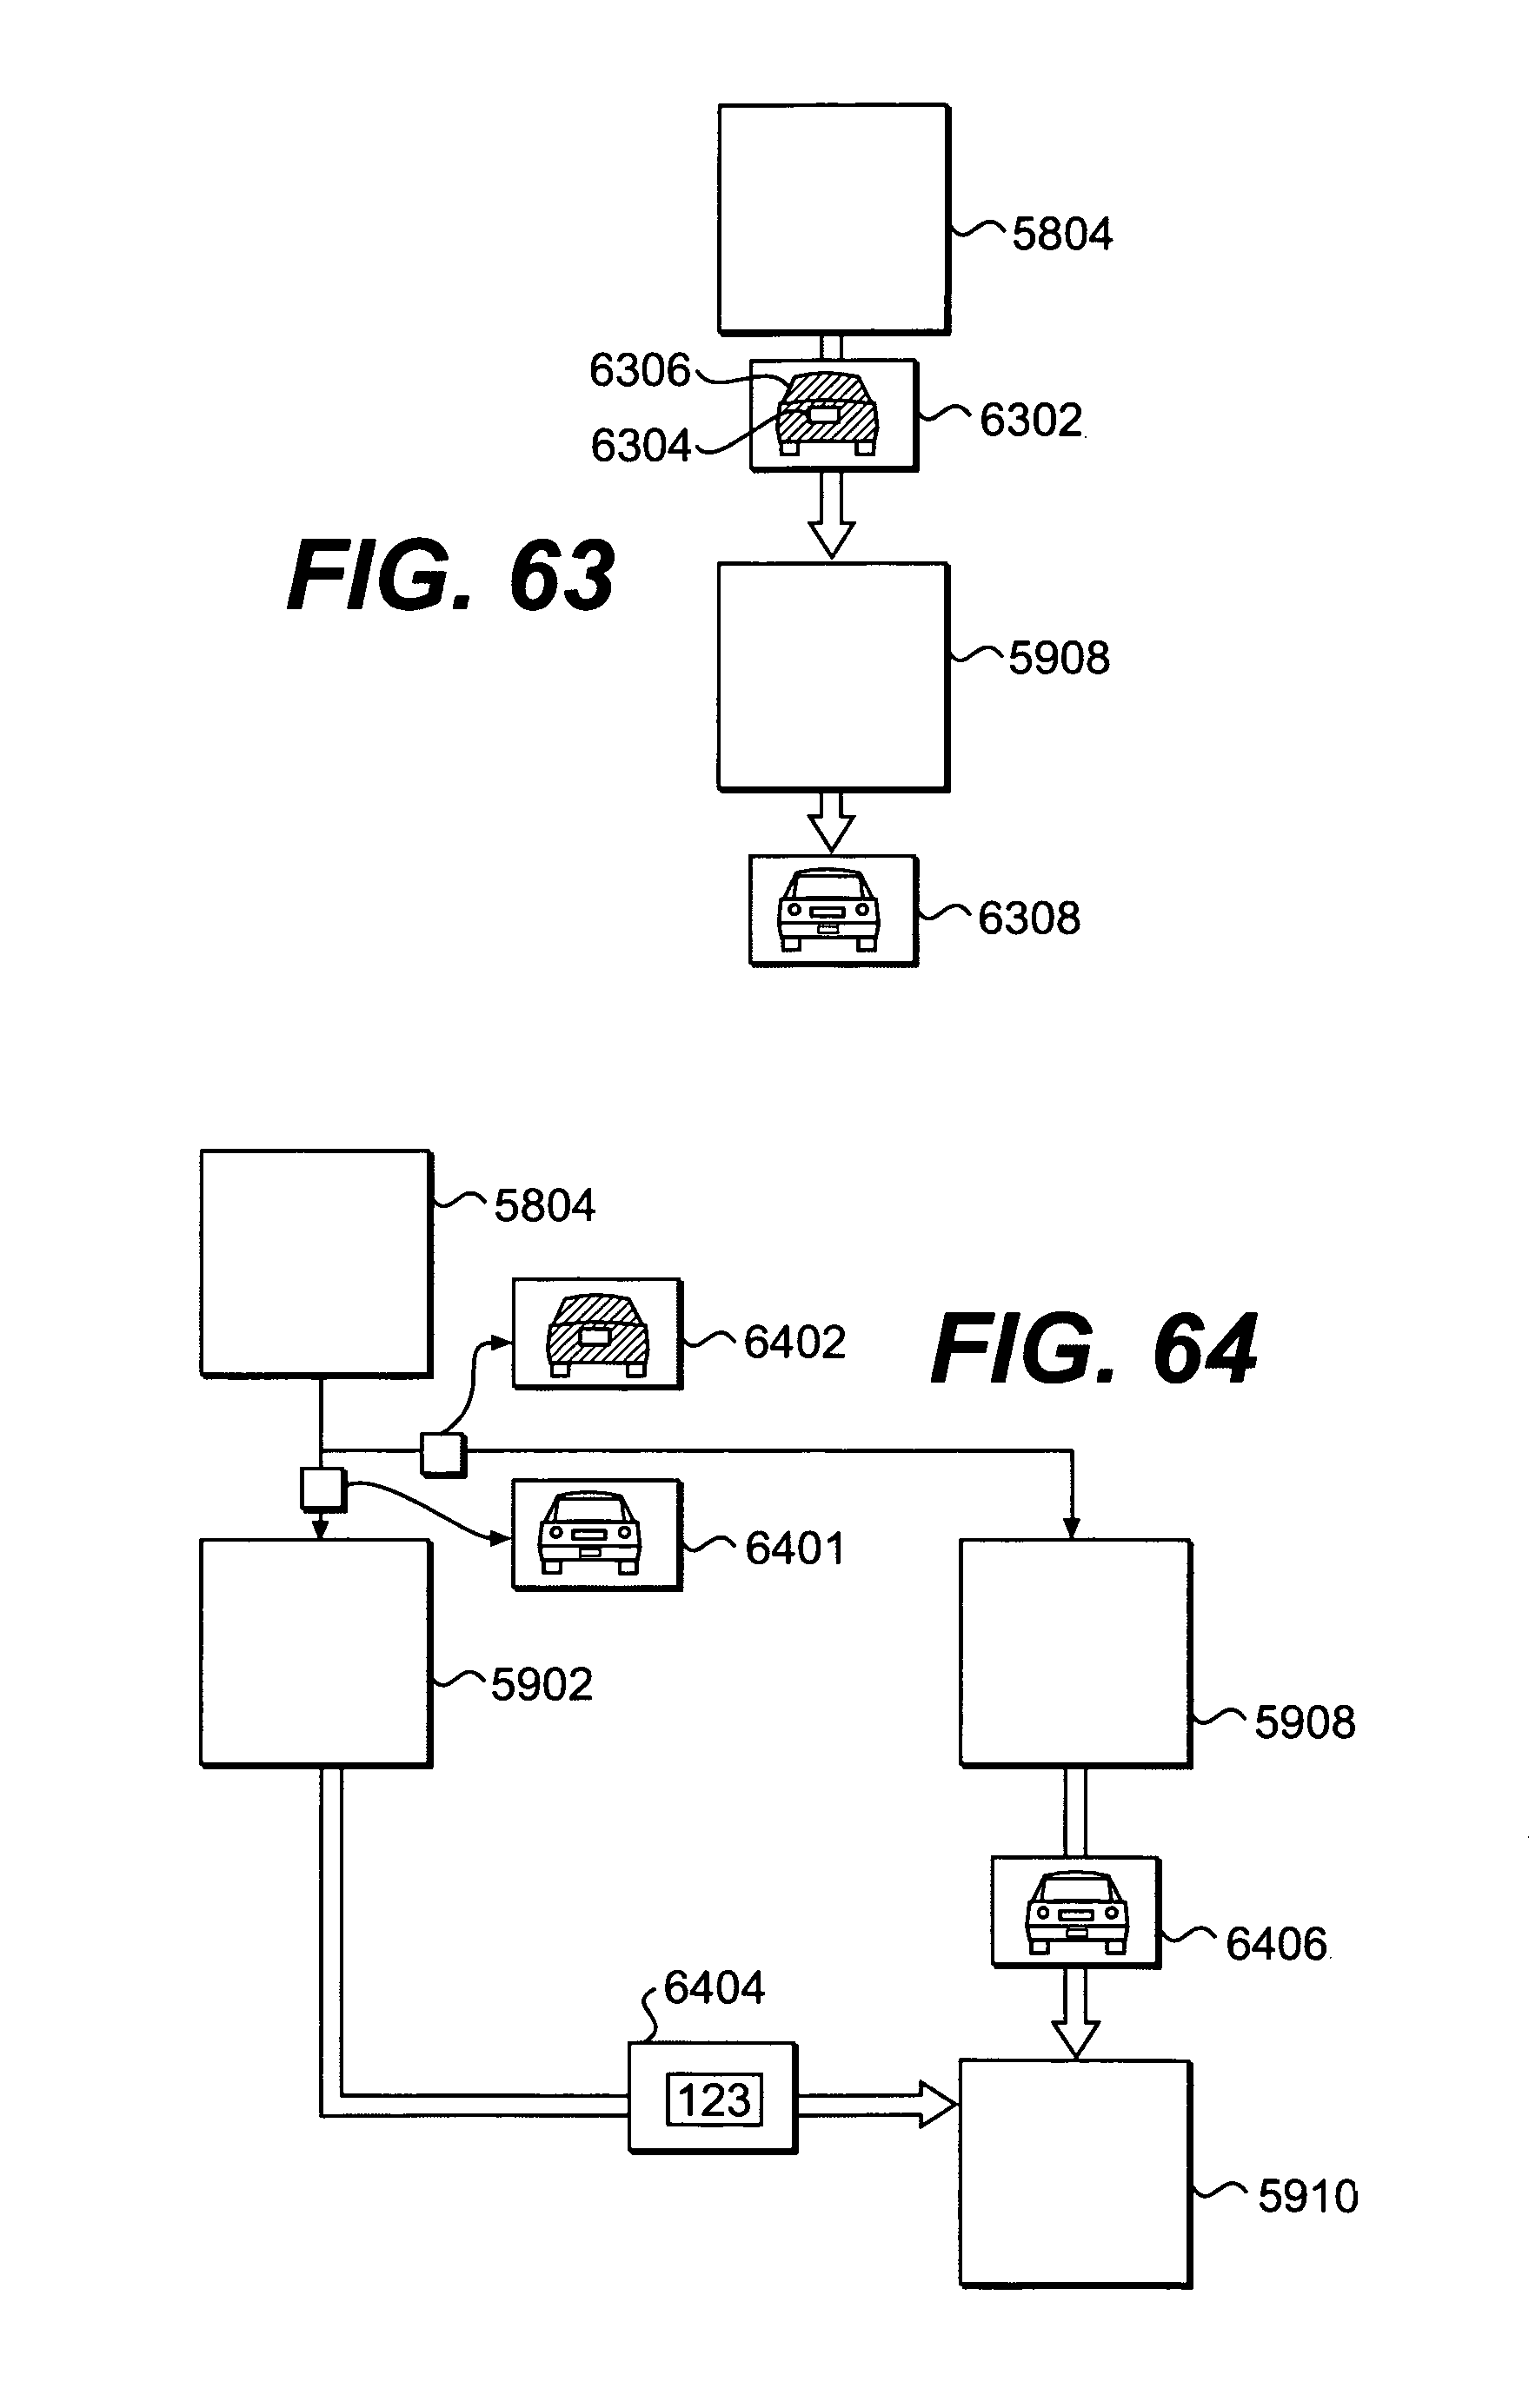 vehicle image capture system